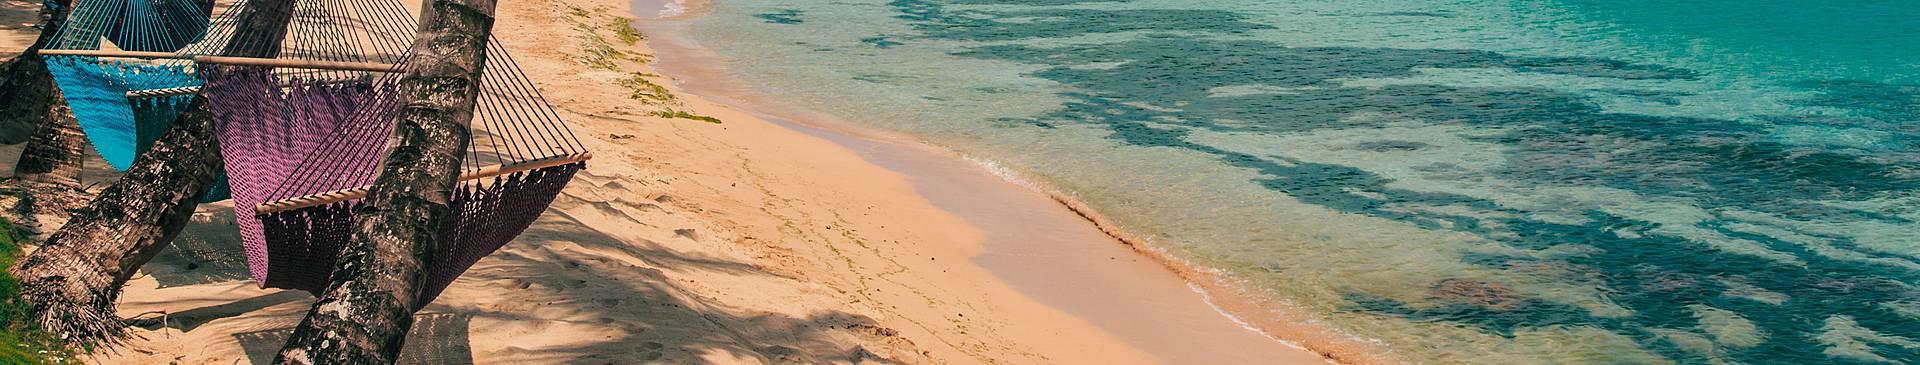 Strand und Meer Nicaragua Reisen